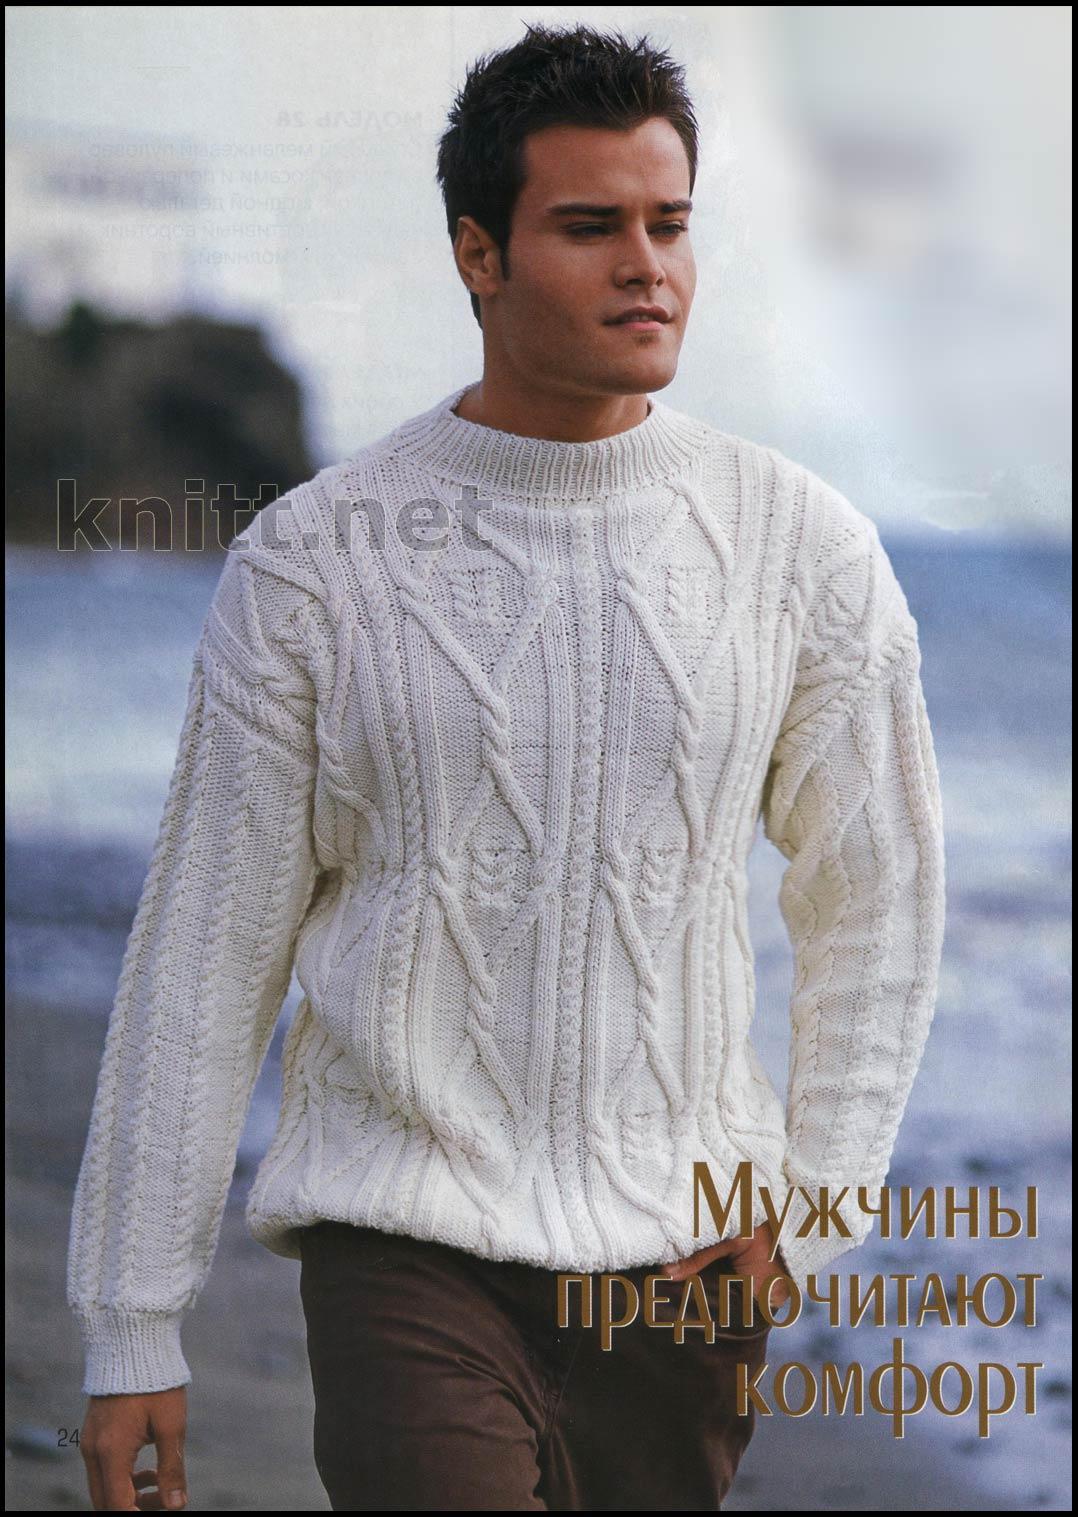 http://knitt.net/wp-content/uploads/2012/03/muzhskoj-uzorchatyj-pulover.jpg